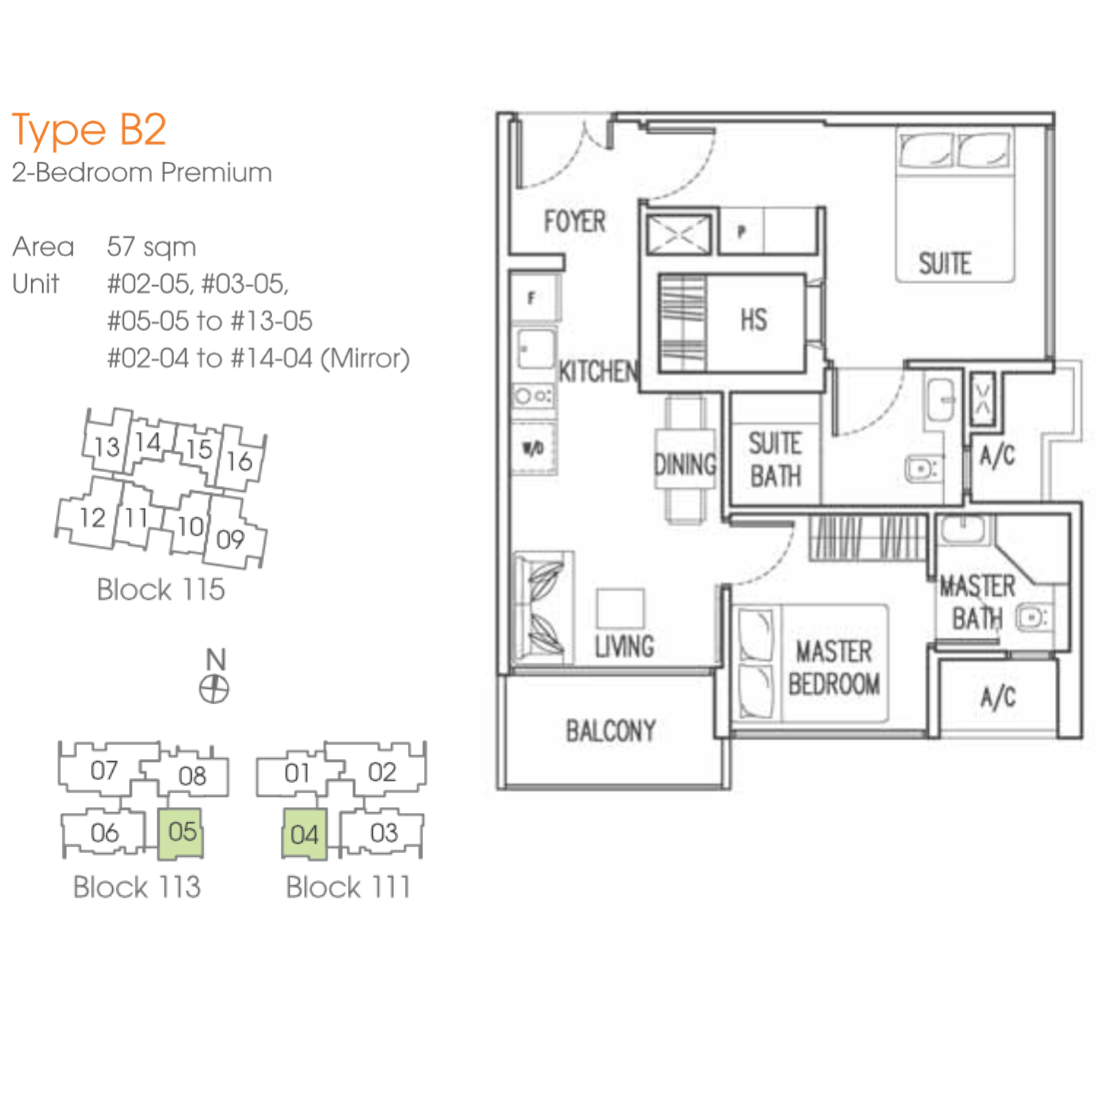 New Launch Condo - Trilive - Floor Plan B2 57sqm 2-Bedroom Premium